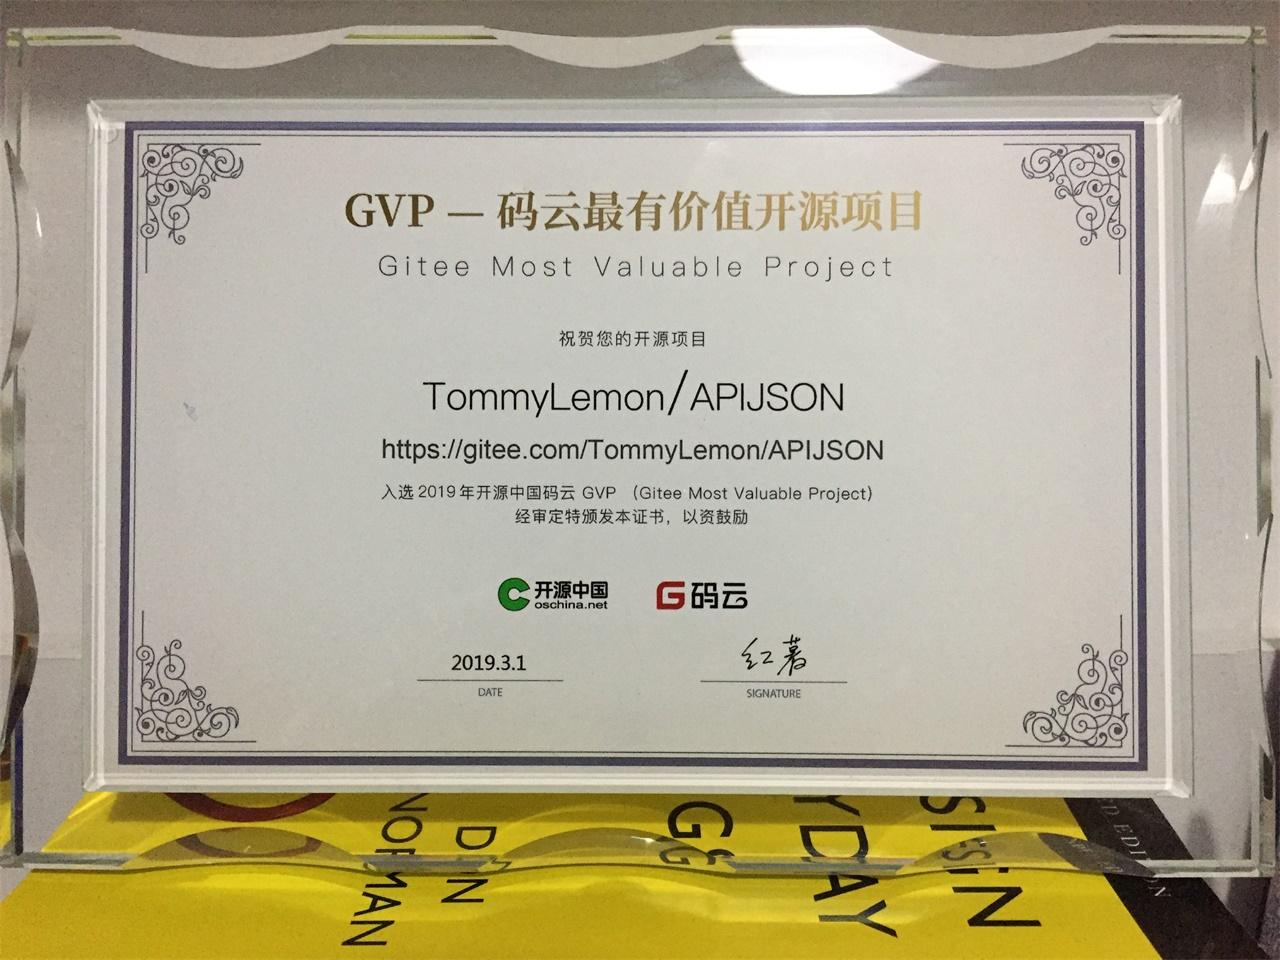 https://raw.githubusercontent.com/TommyLemon/StaticResources/master/APIJSON_GVPAwardCertificate-small.jpg